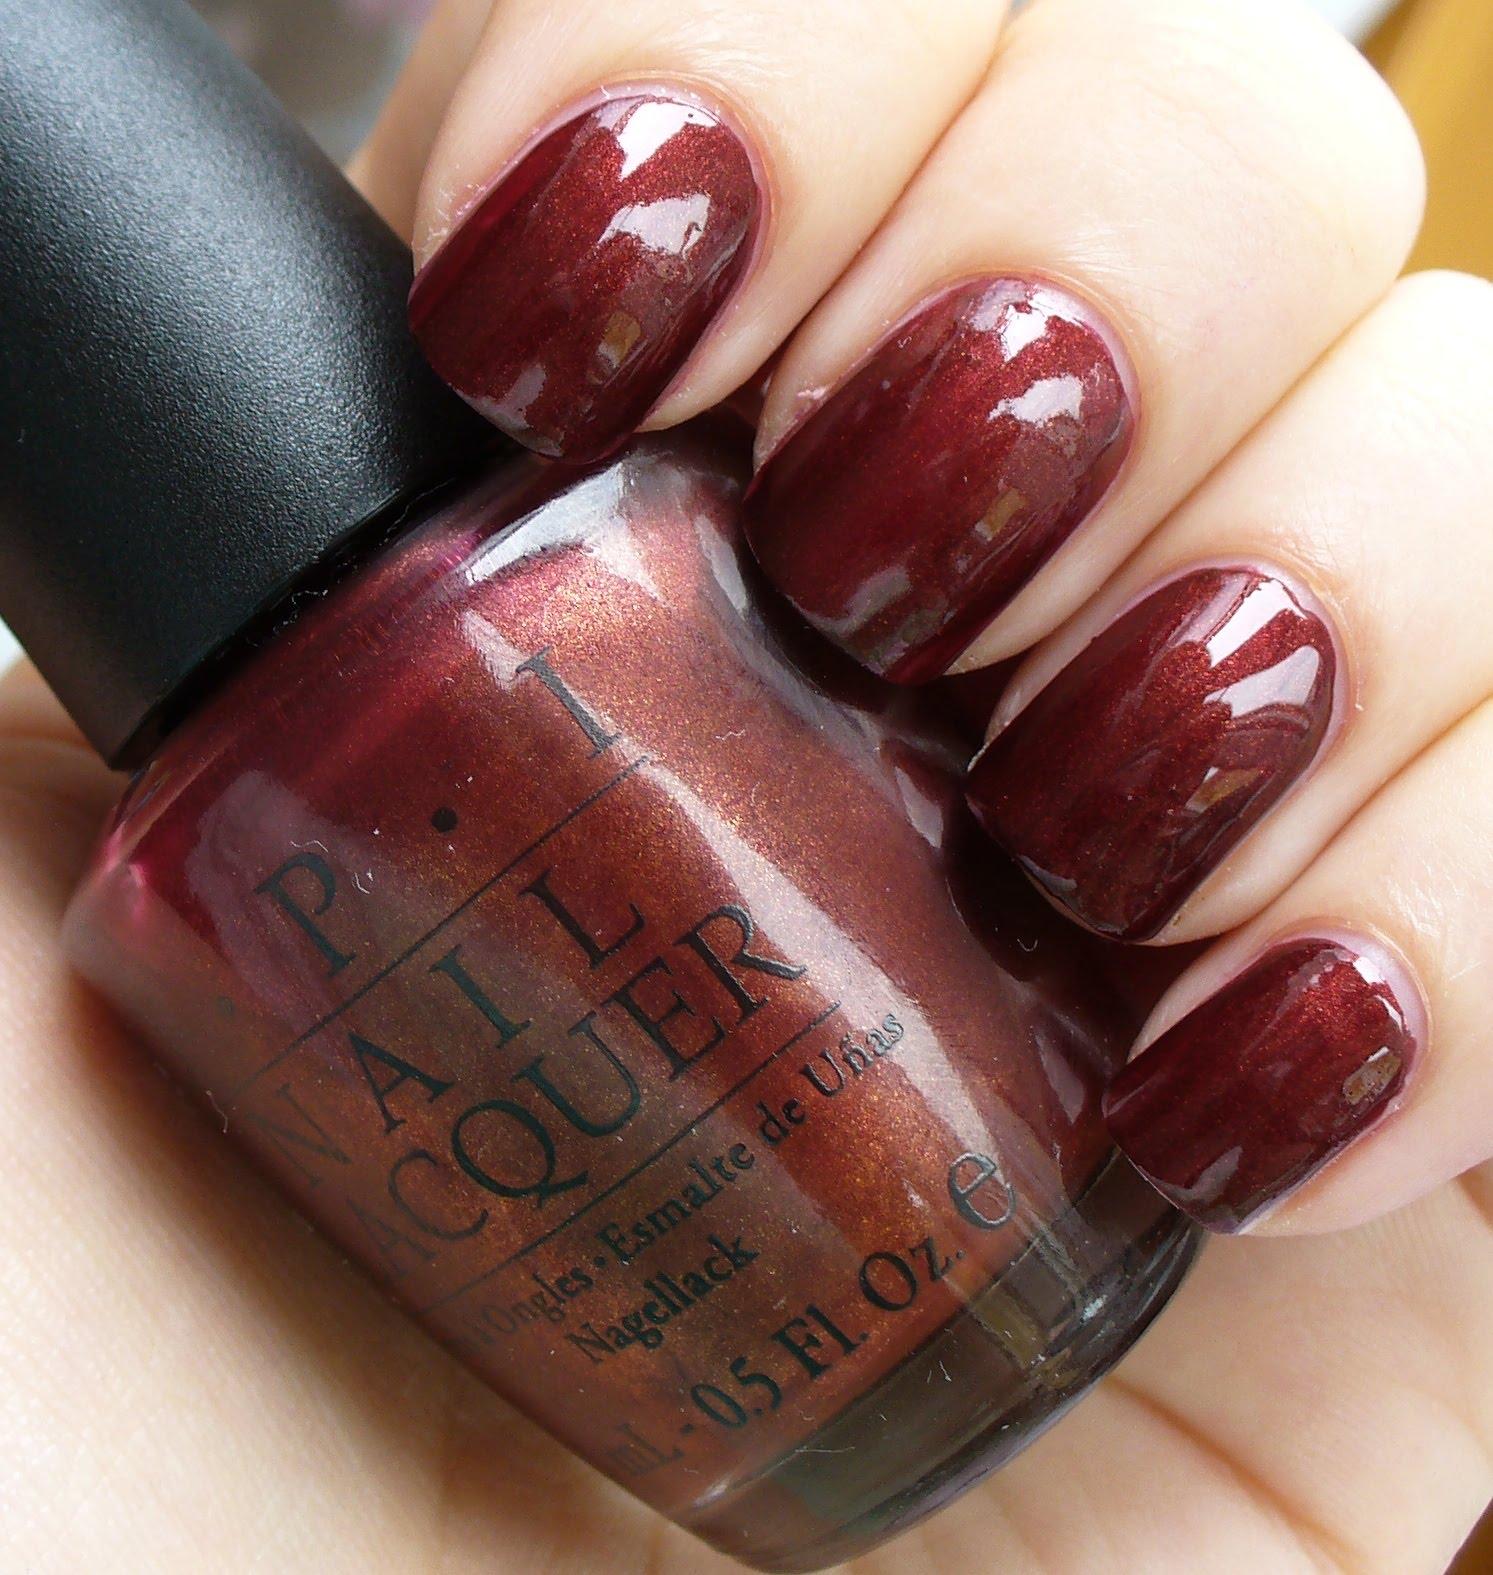 Fancy Opi Nail Polish Romeo And Juliet Embellishment - Nail Art ...